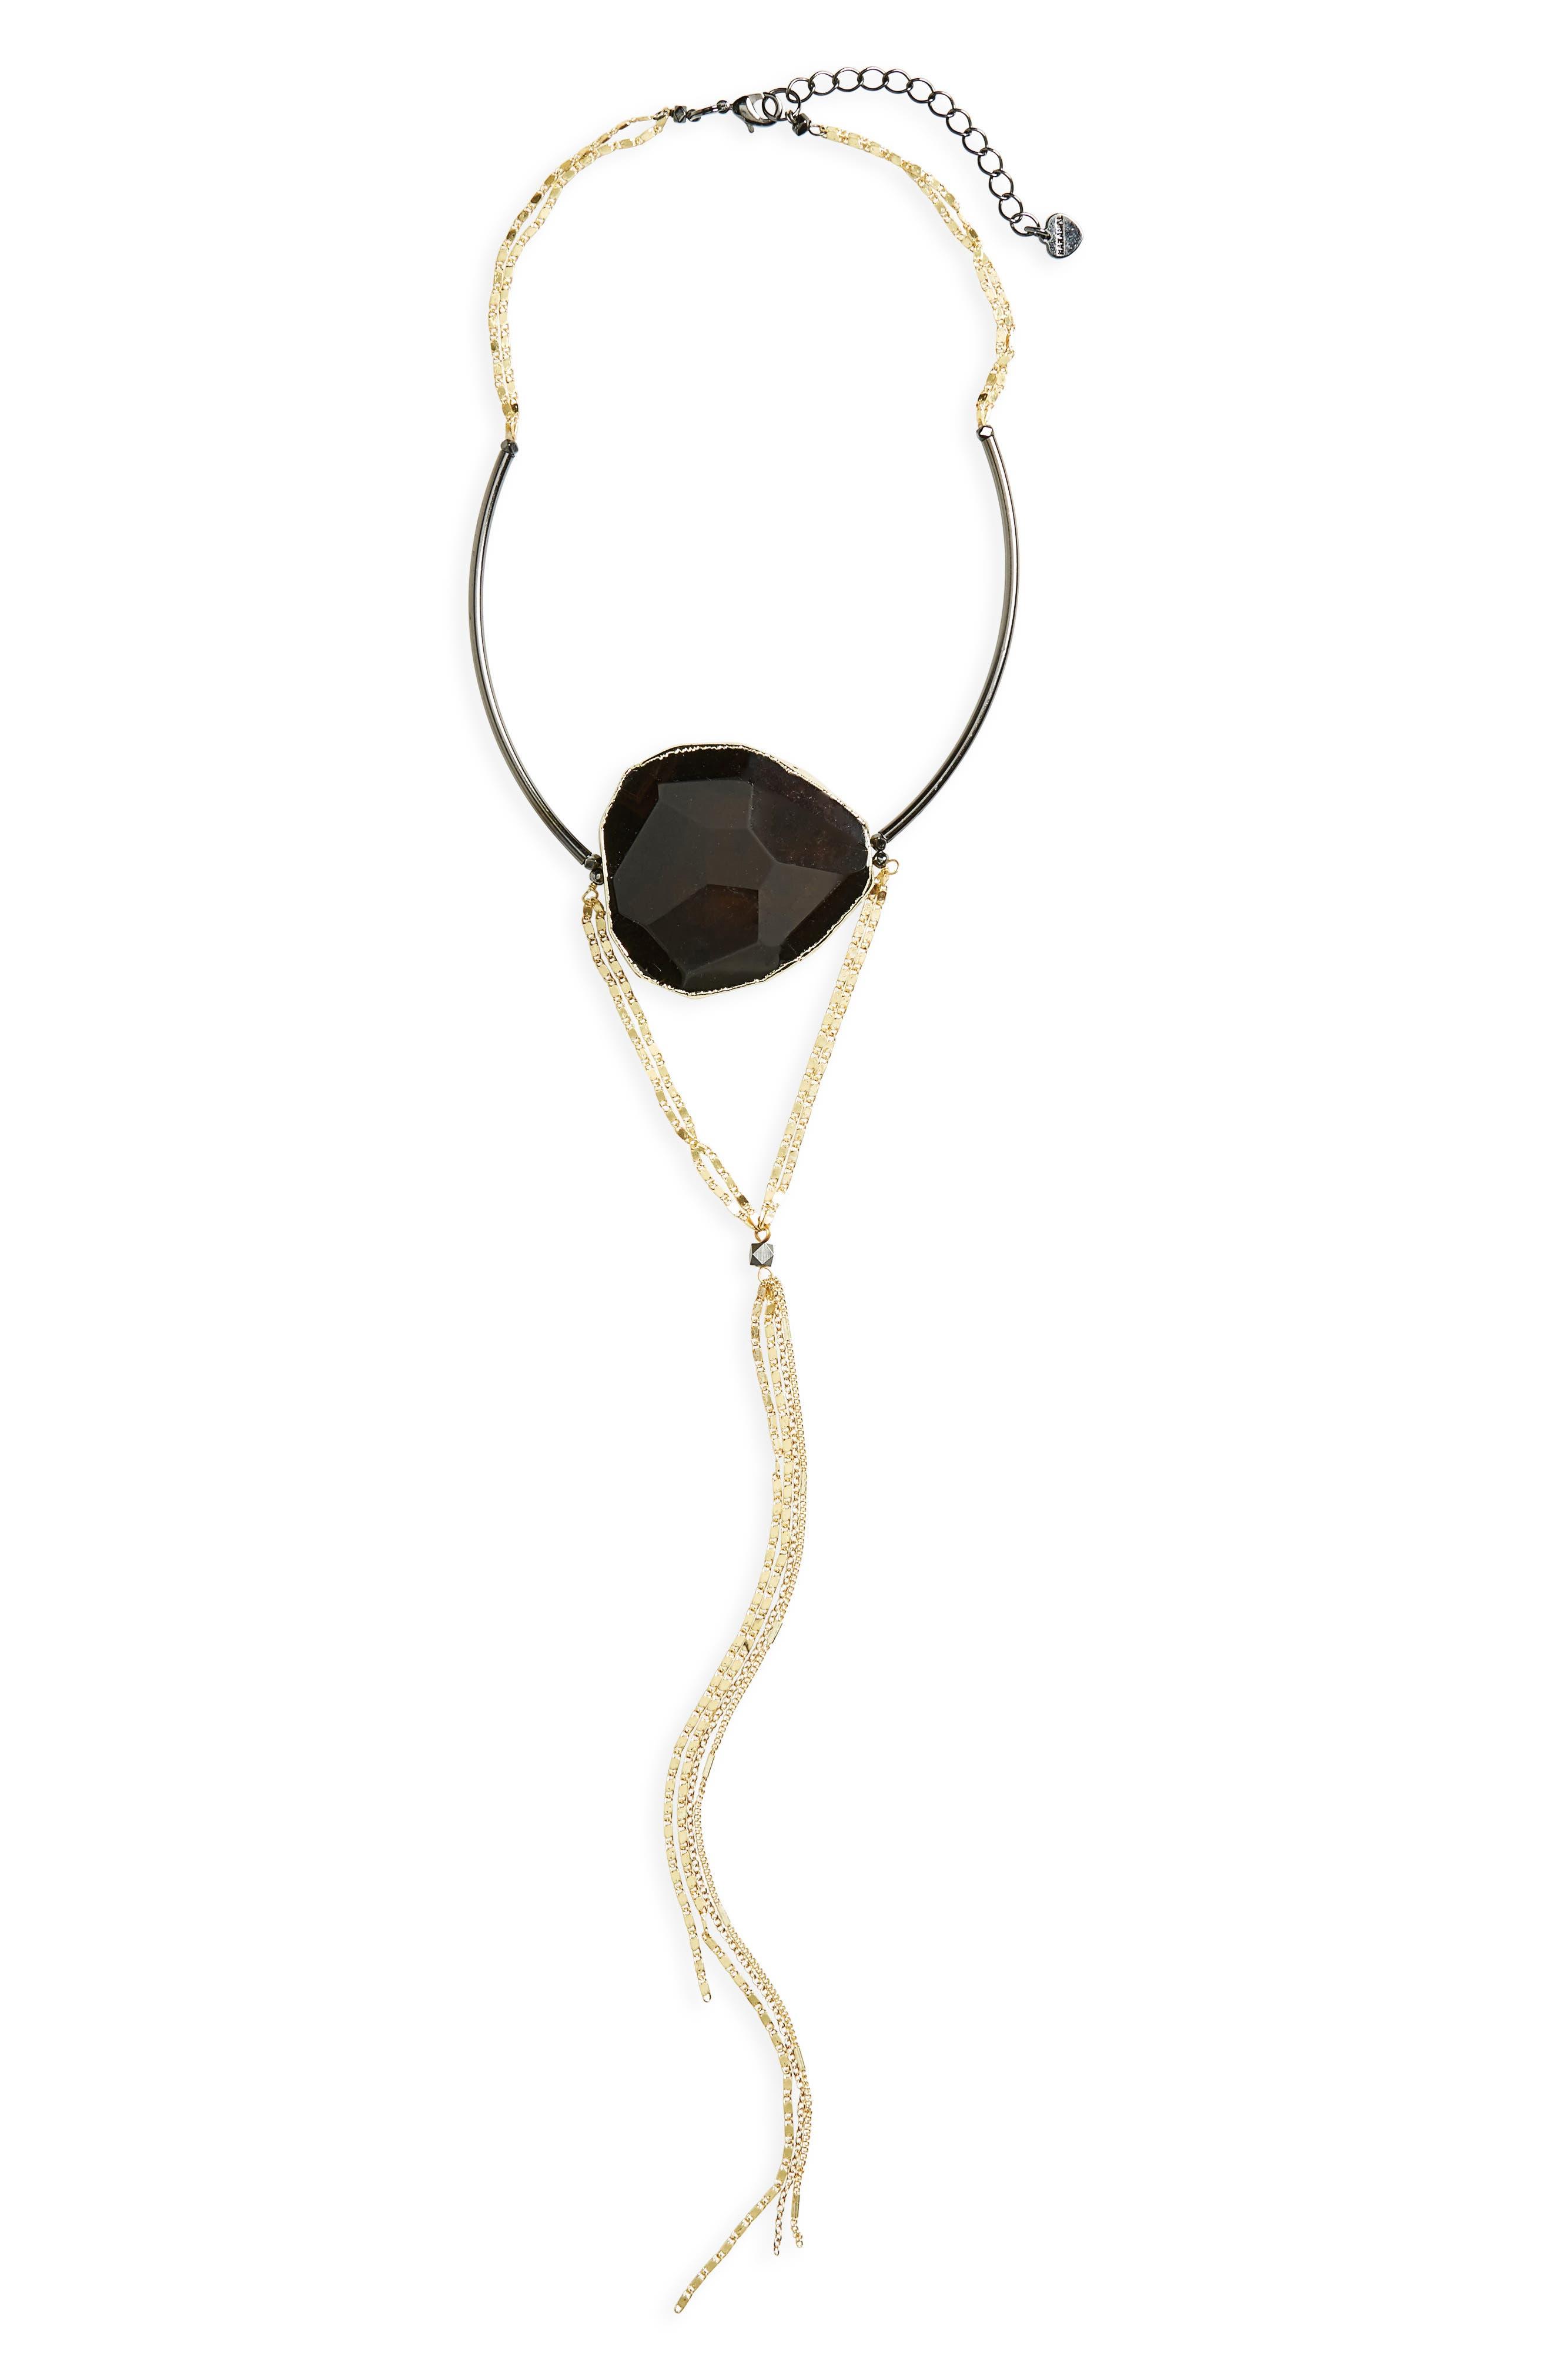 Main Image - Nakamol Design Agate Pendant Choker Y-Necklace